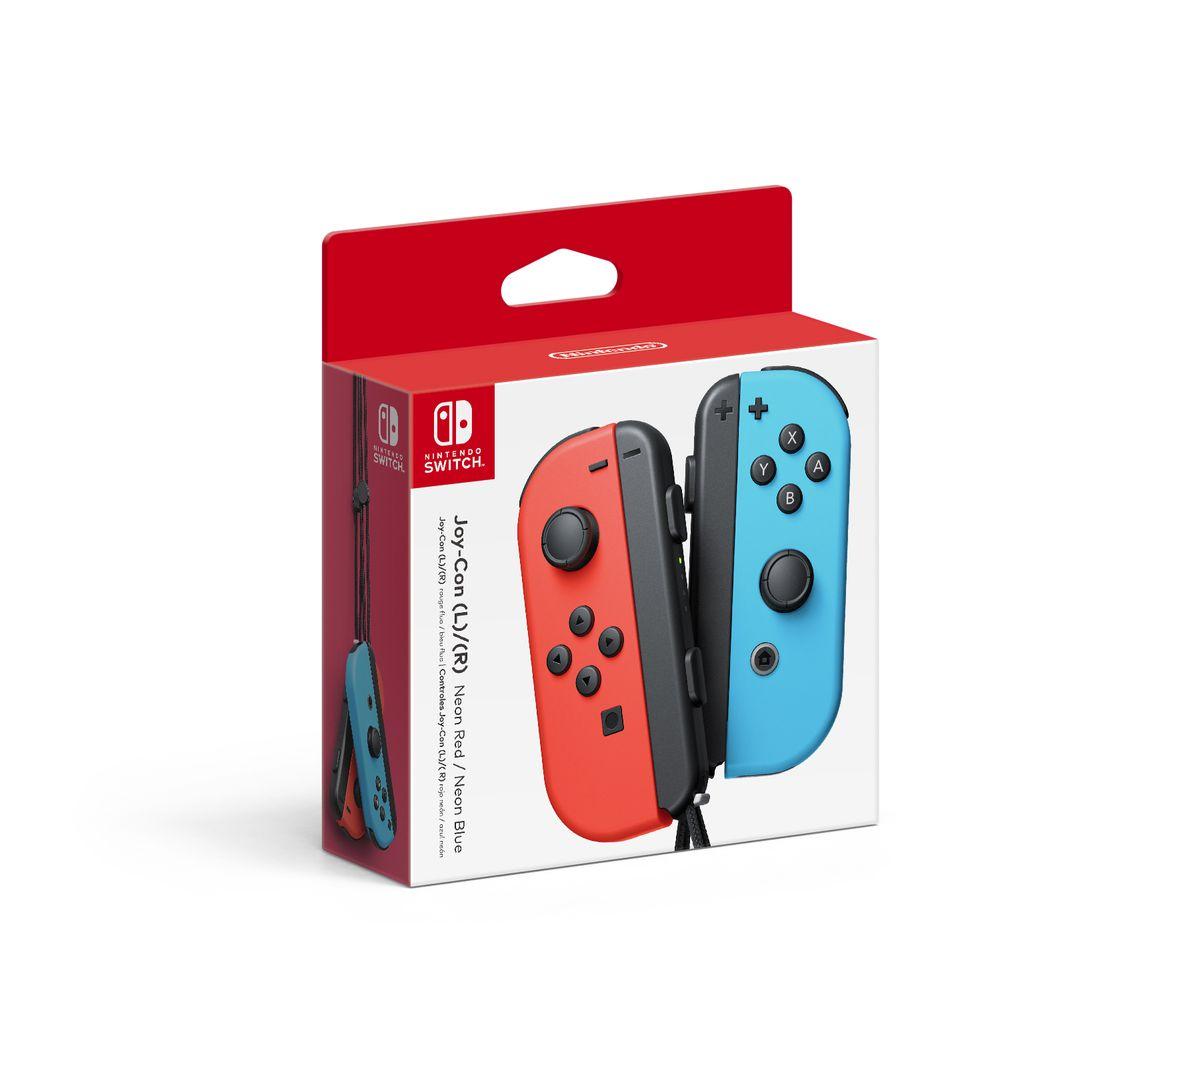 Nintendo Switch extra Joy-Con pair